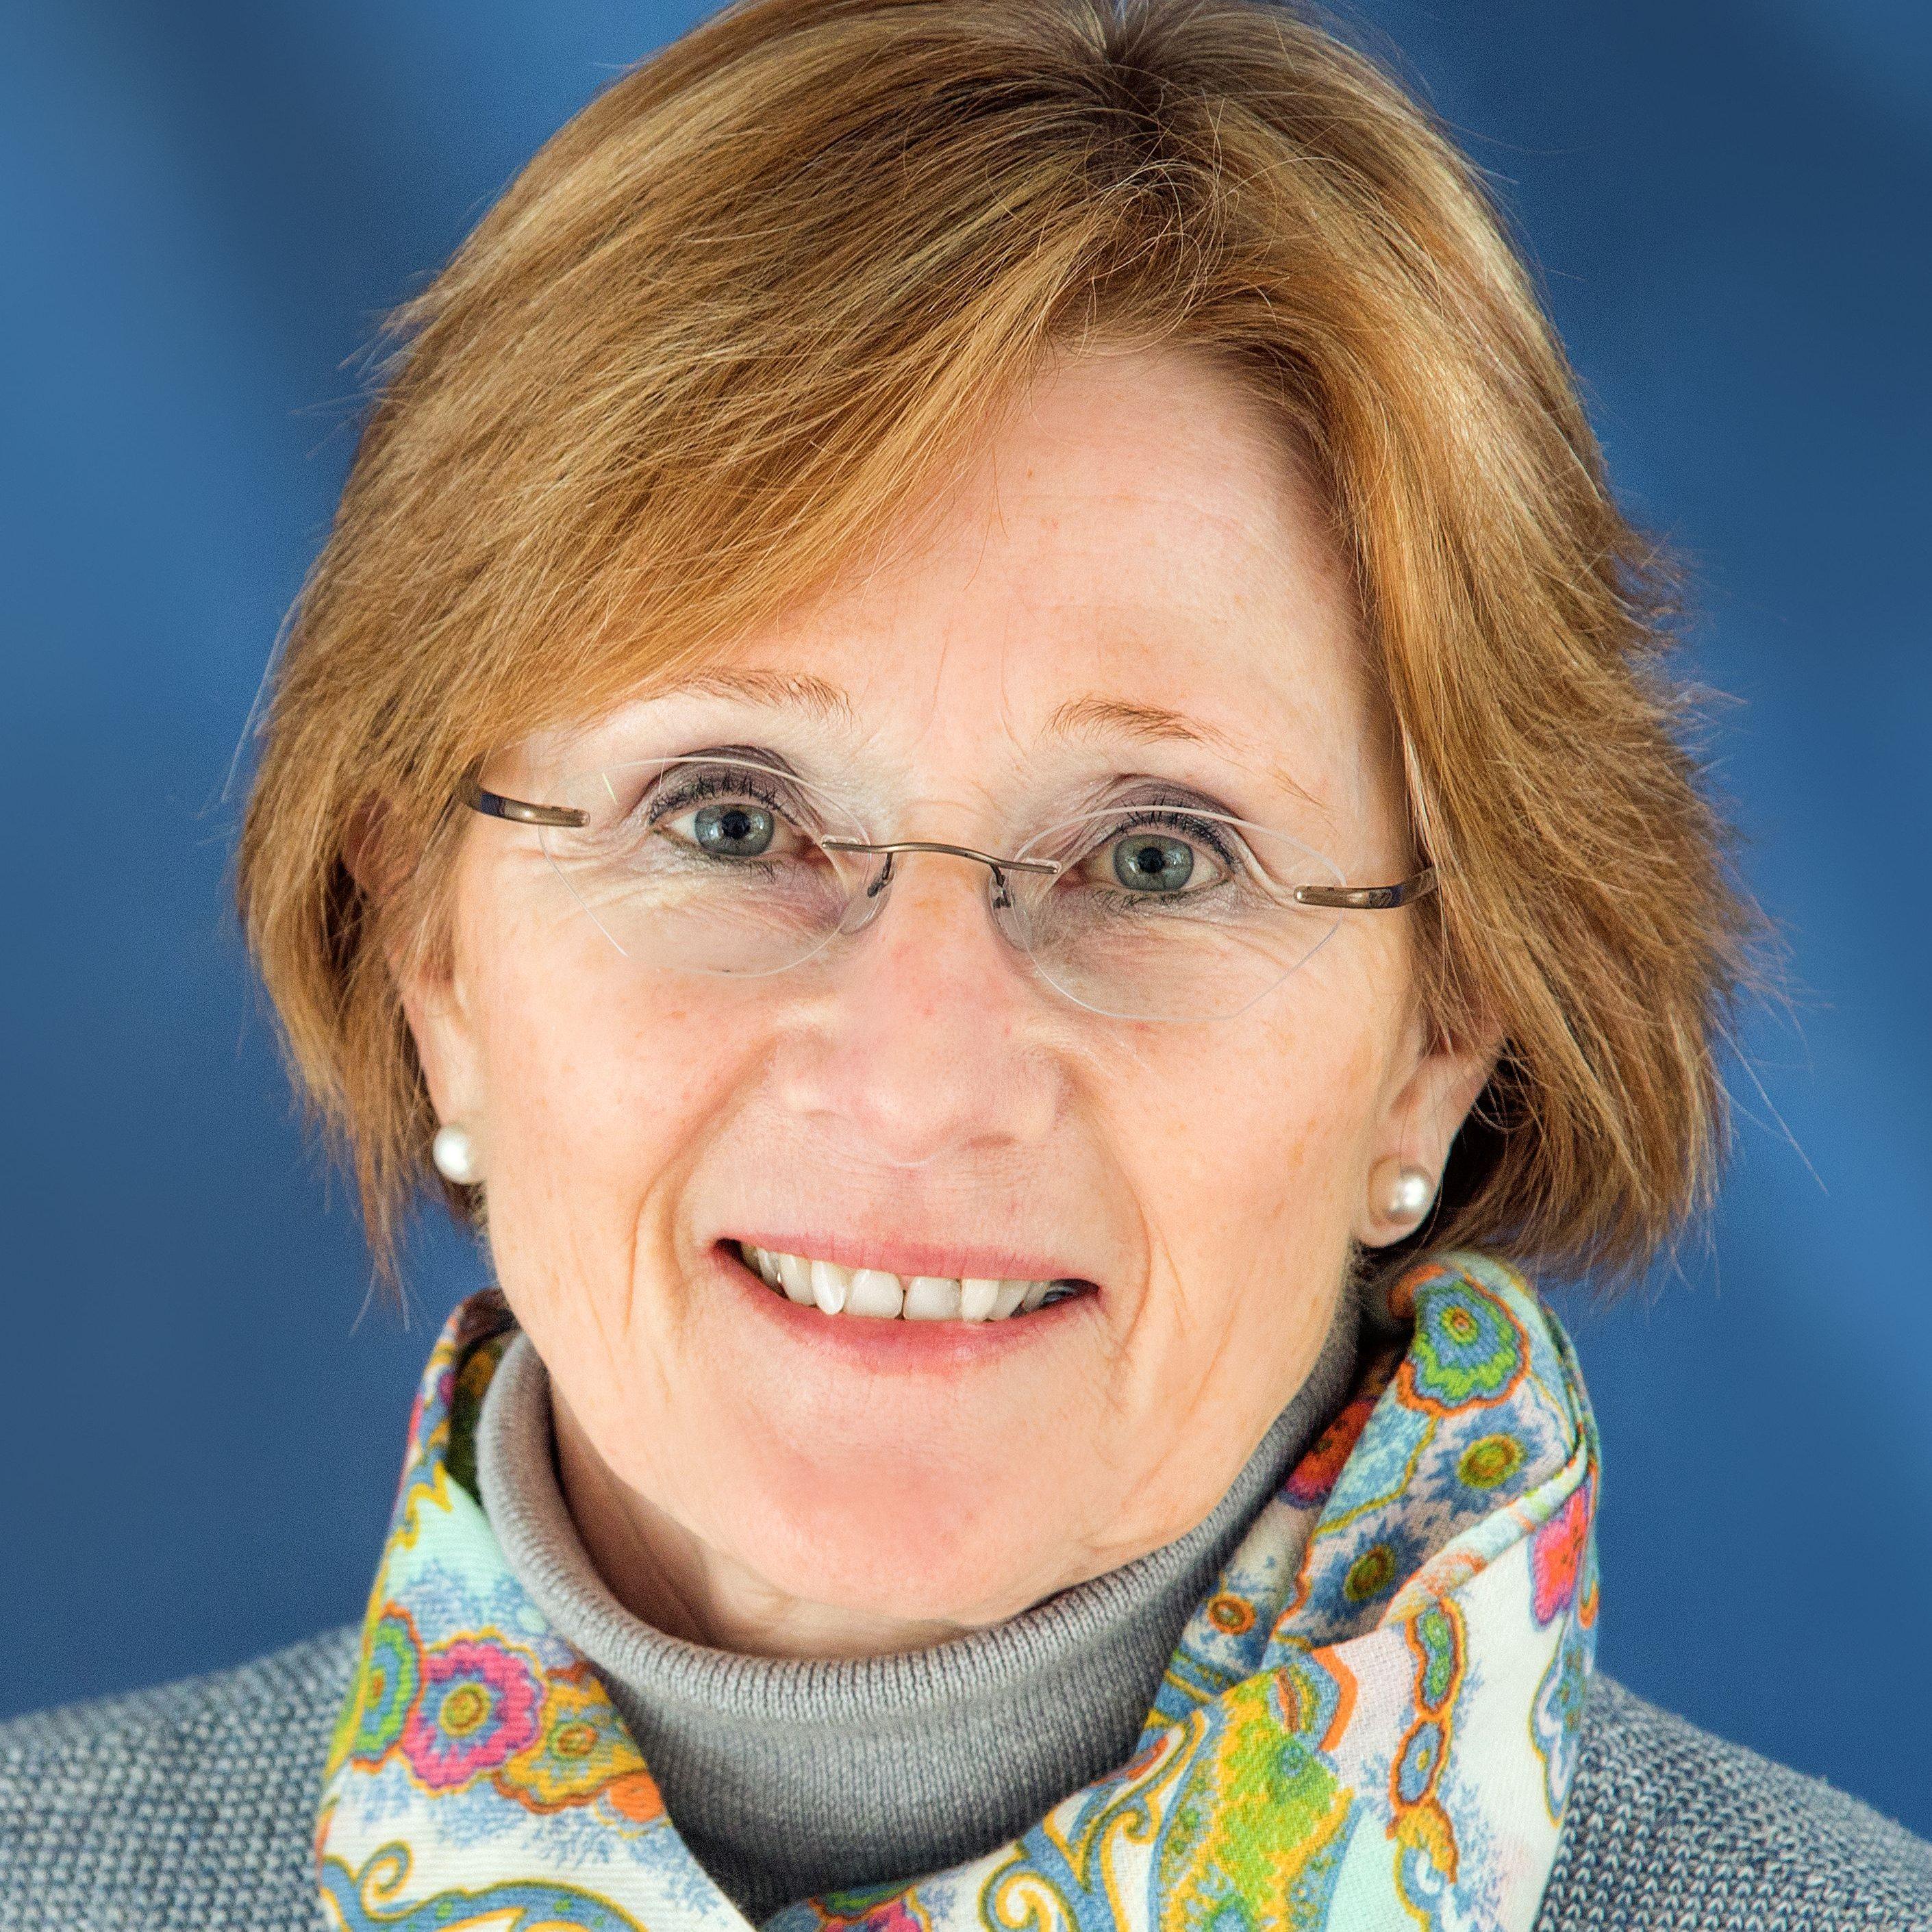 Maria Stähler